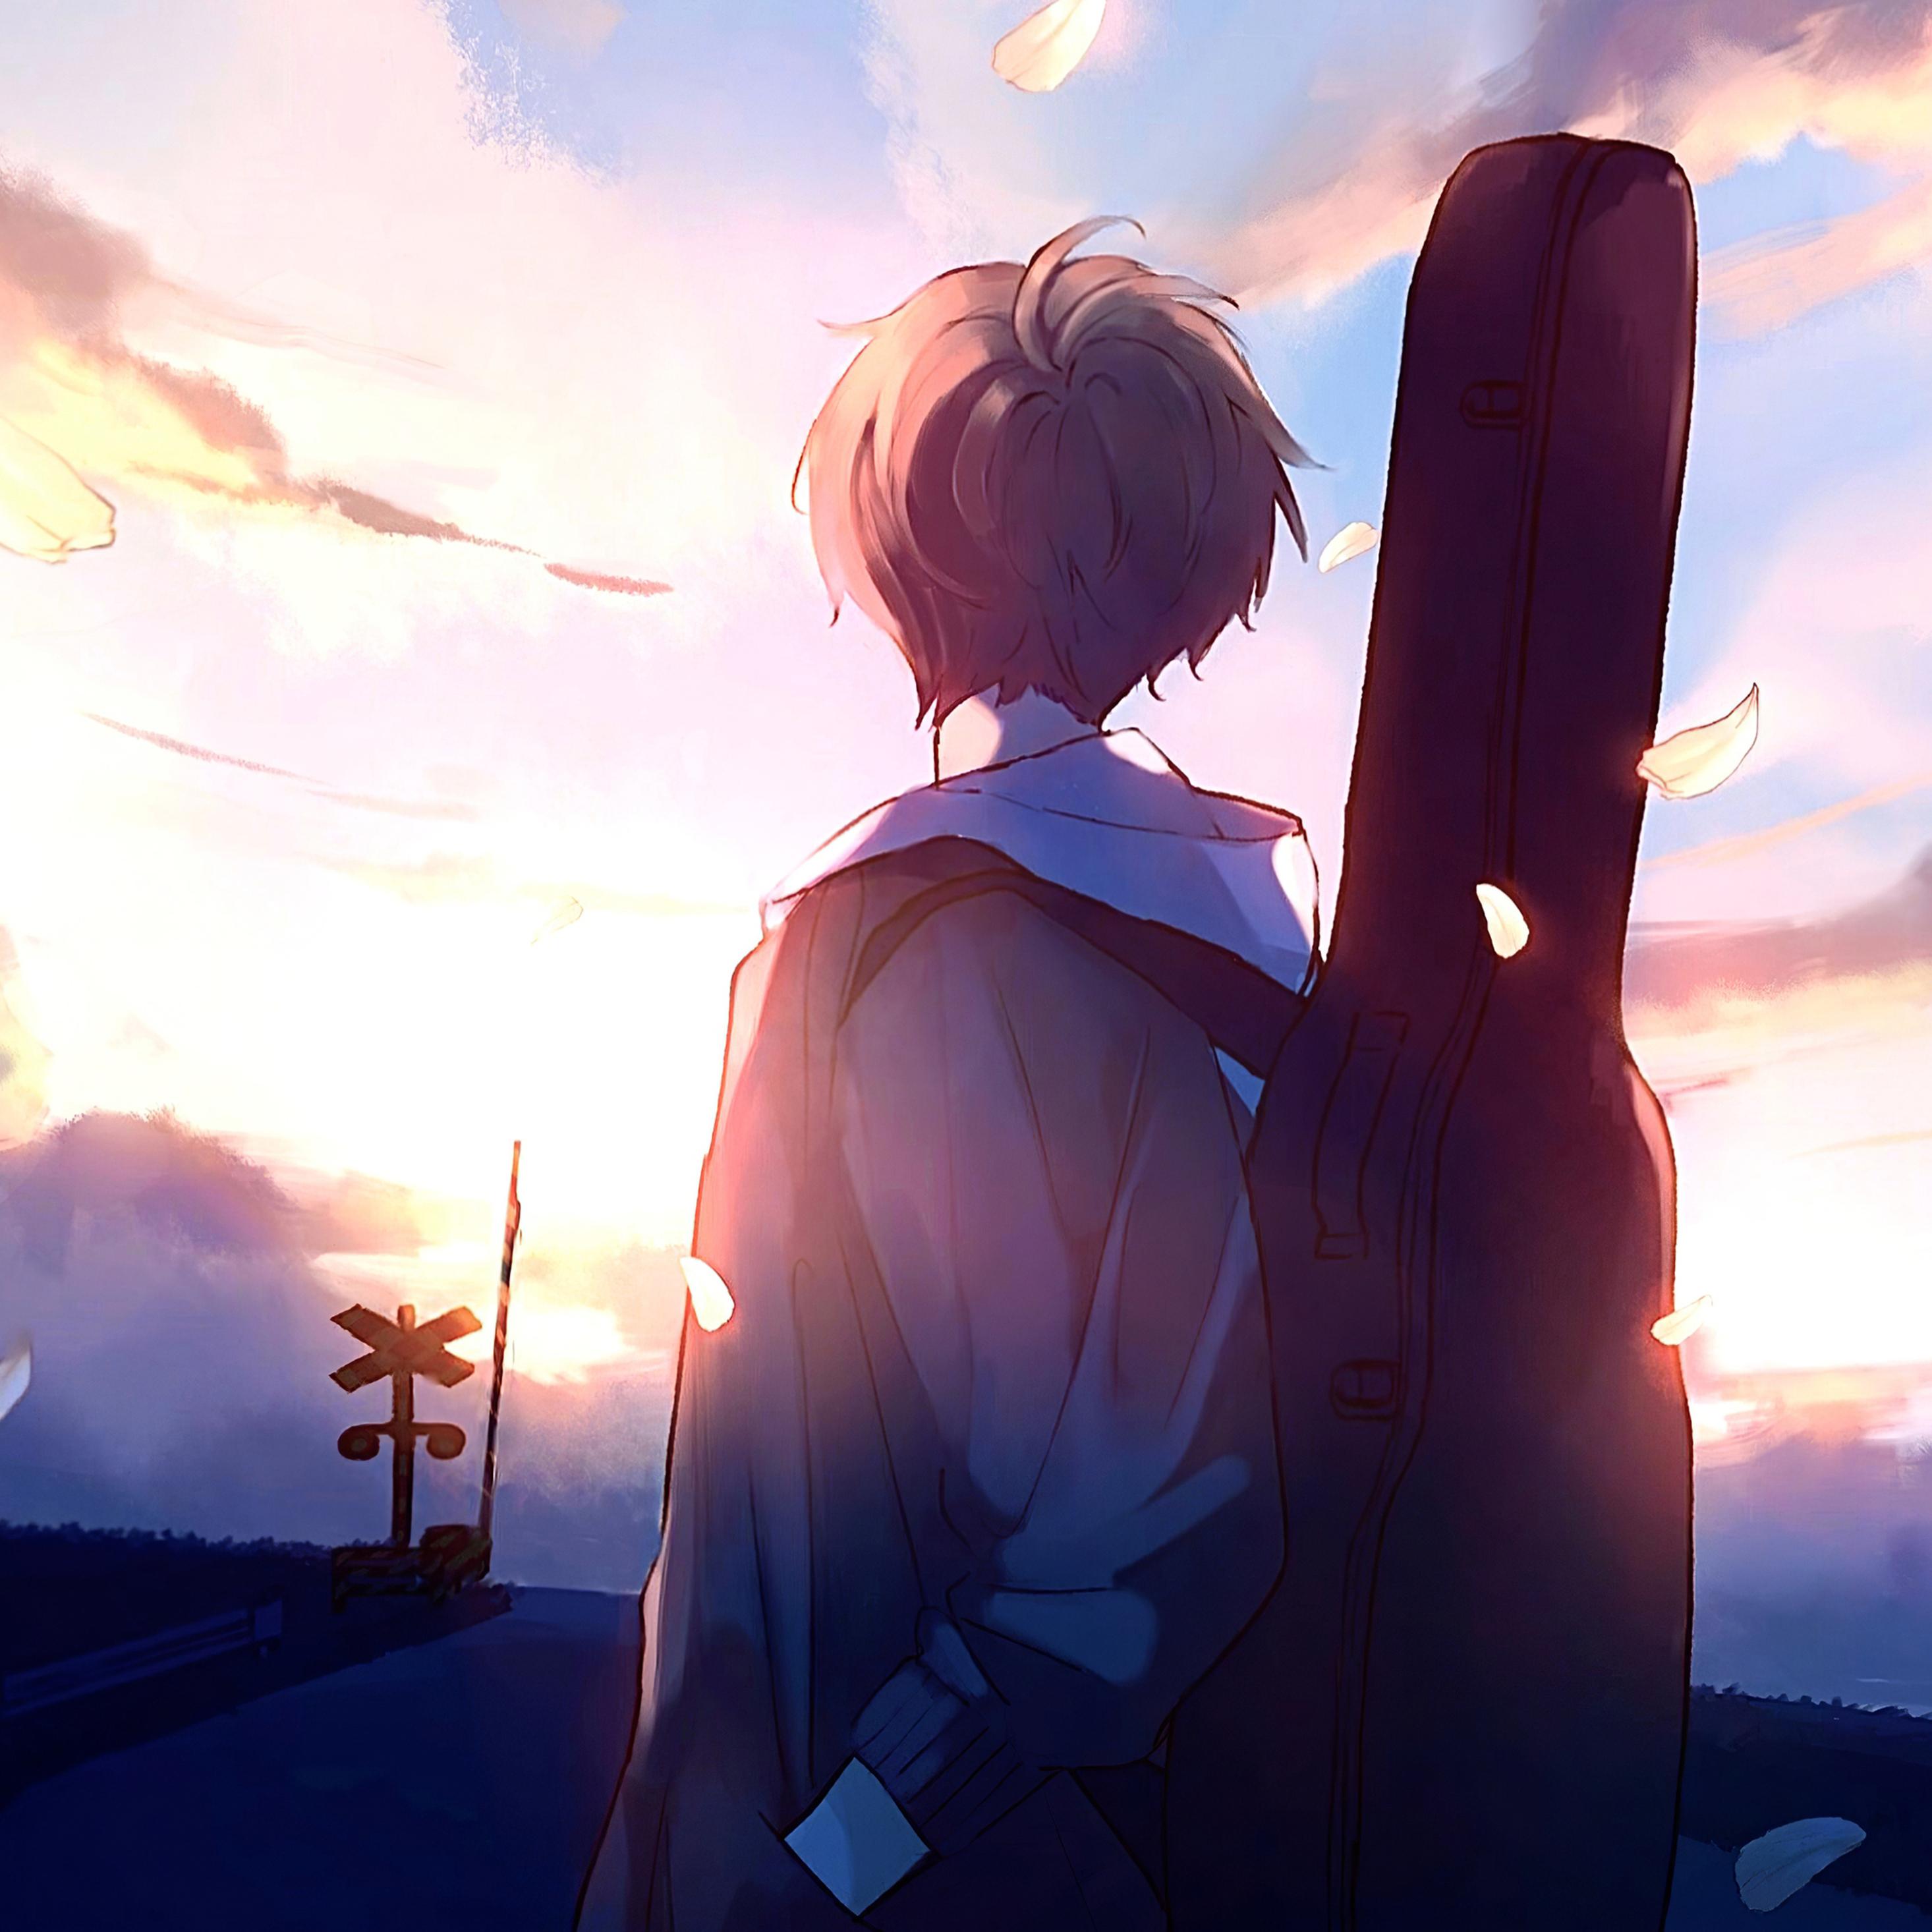 2932x2932 Anime Boy Guitar Painting Ipad Pro Retina Display Hd 4k